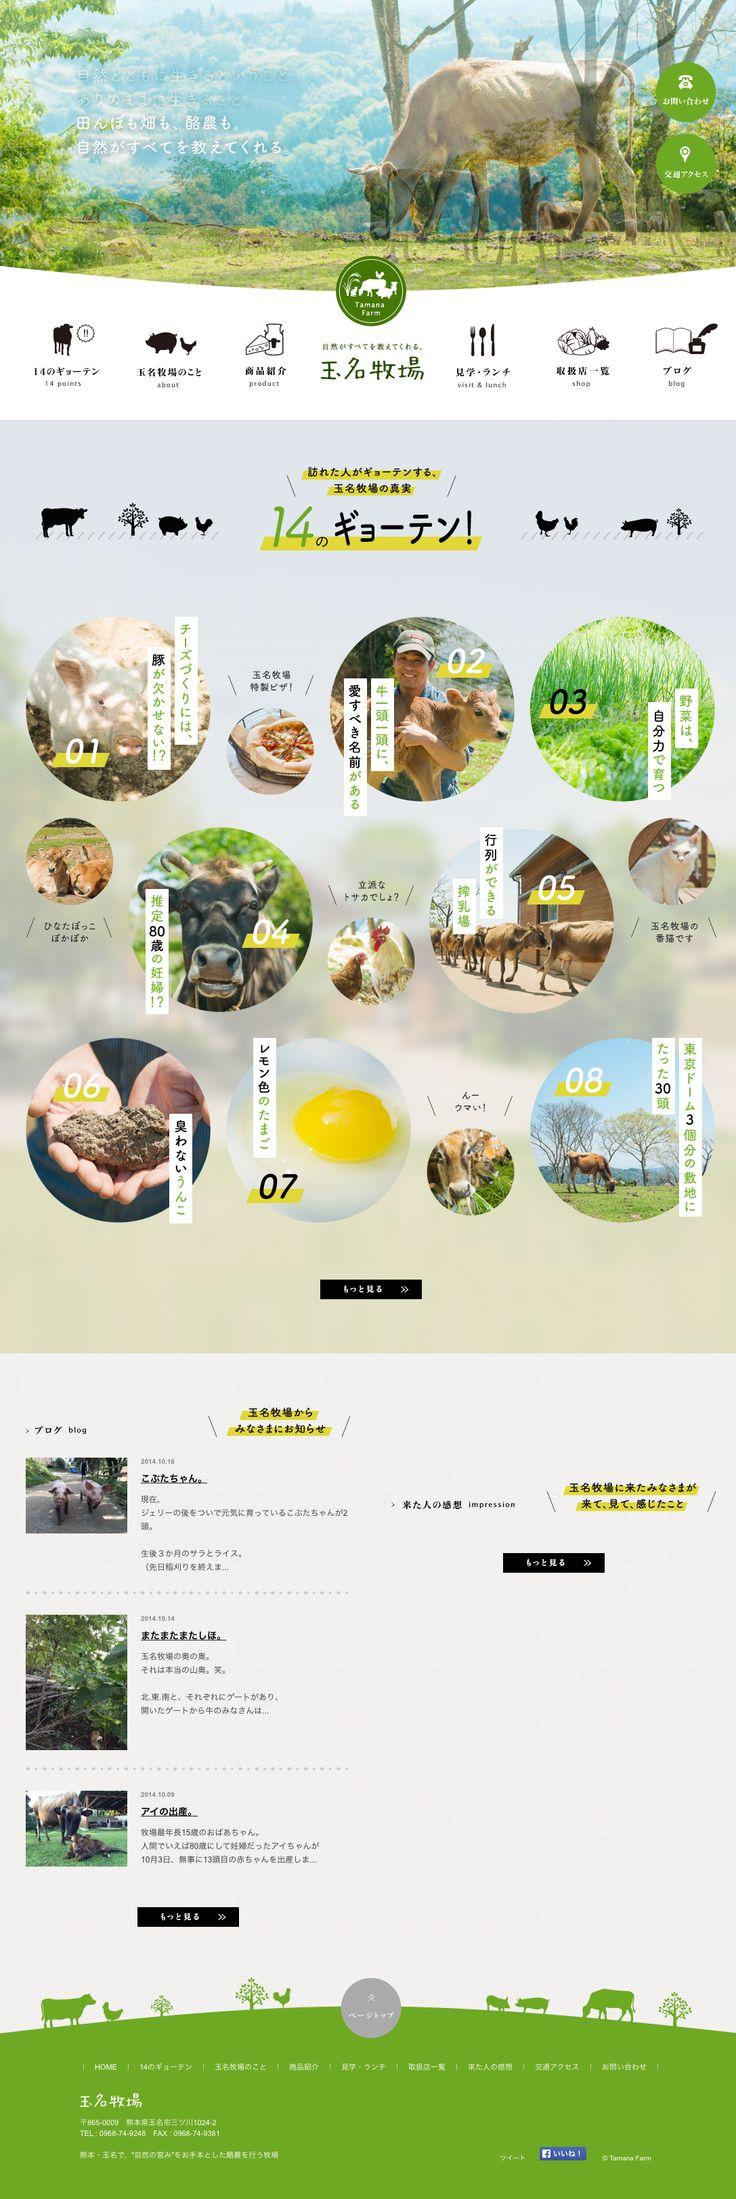 farm website inspiration